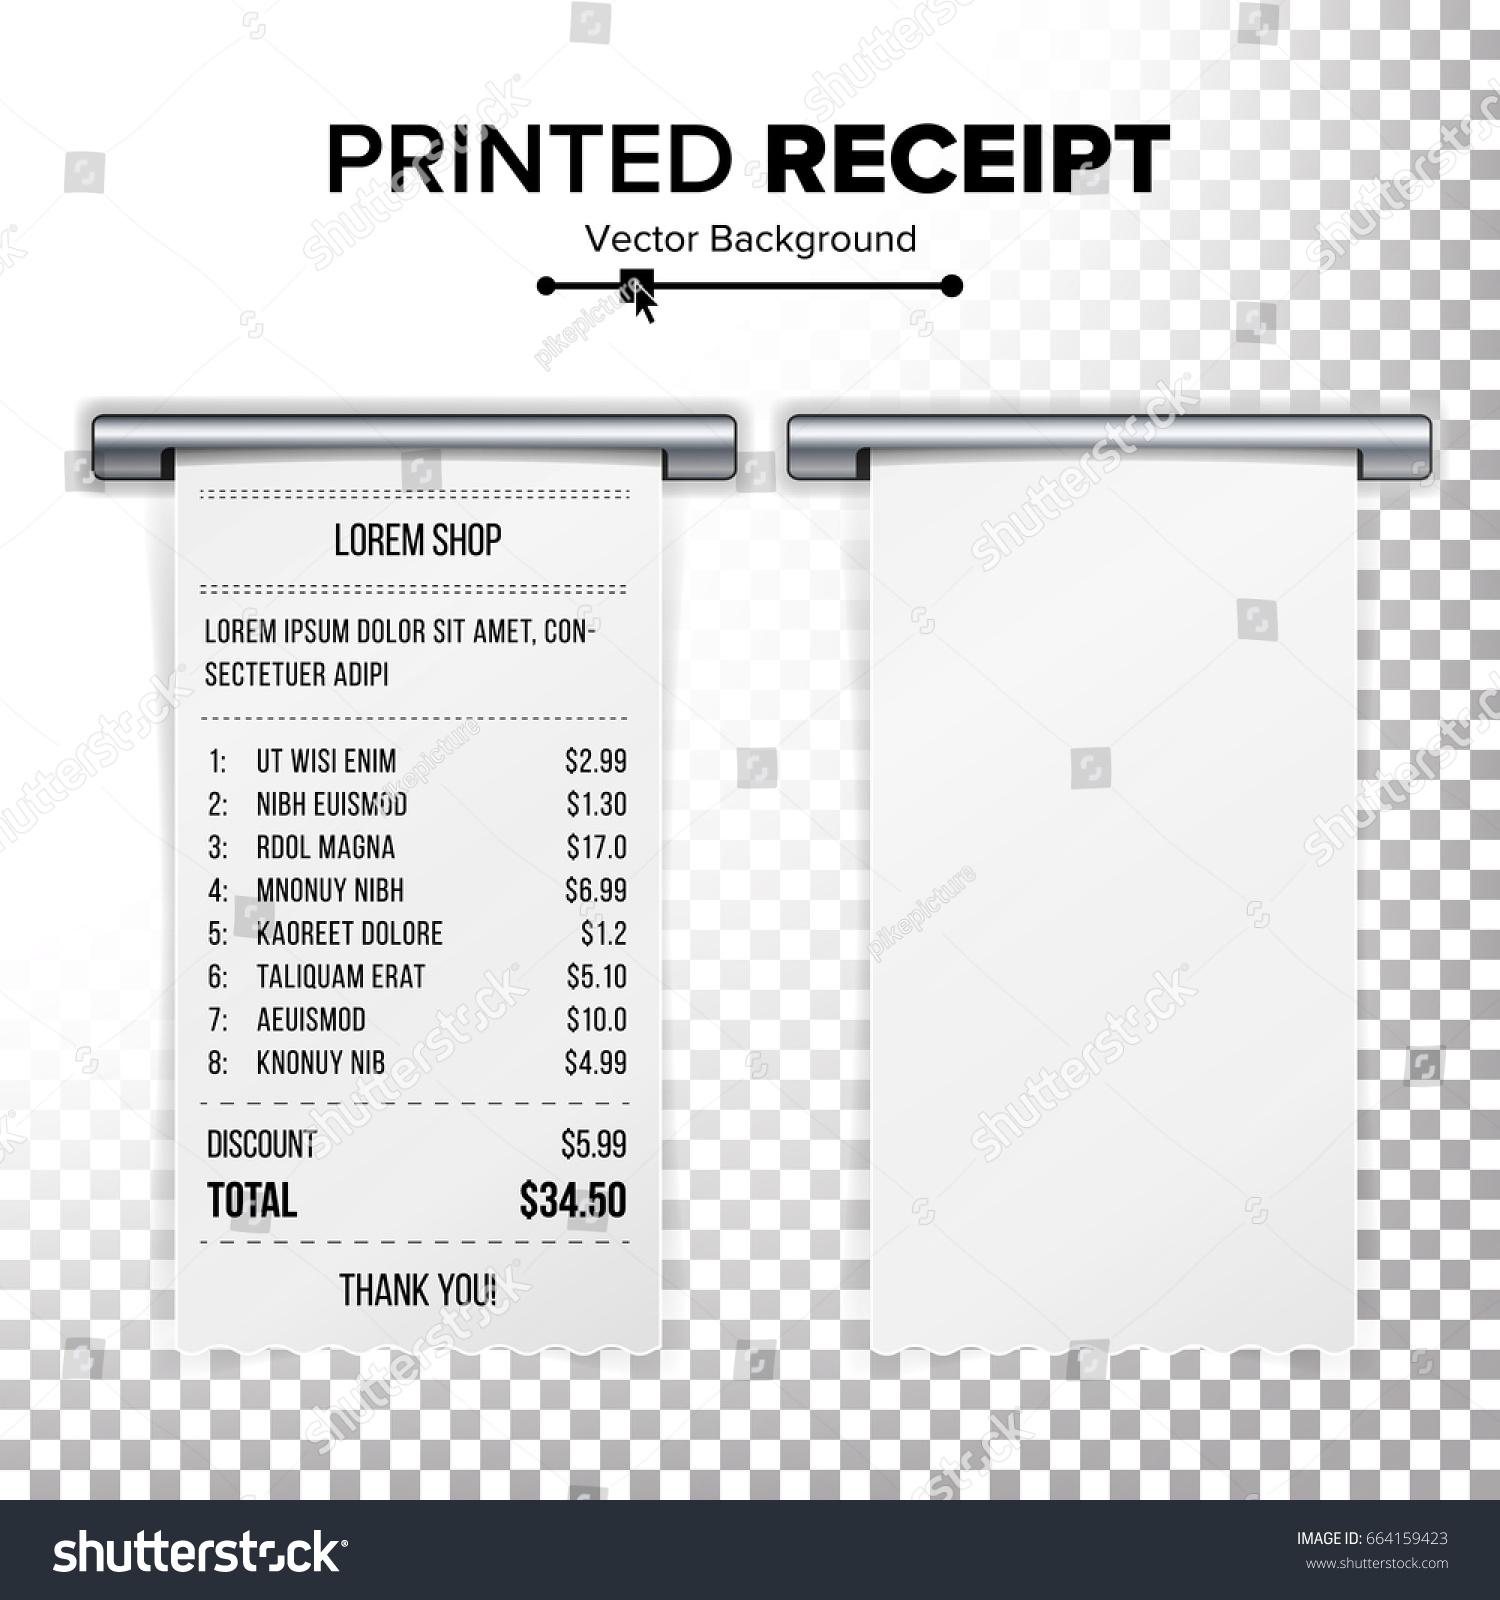 Sales Printed Receipt Vector Bill Atm Stock Vector Royalty Free